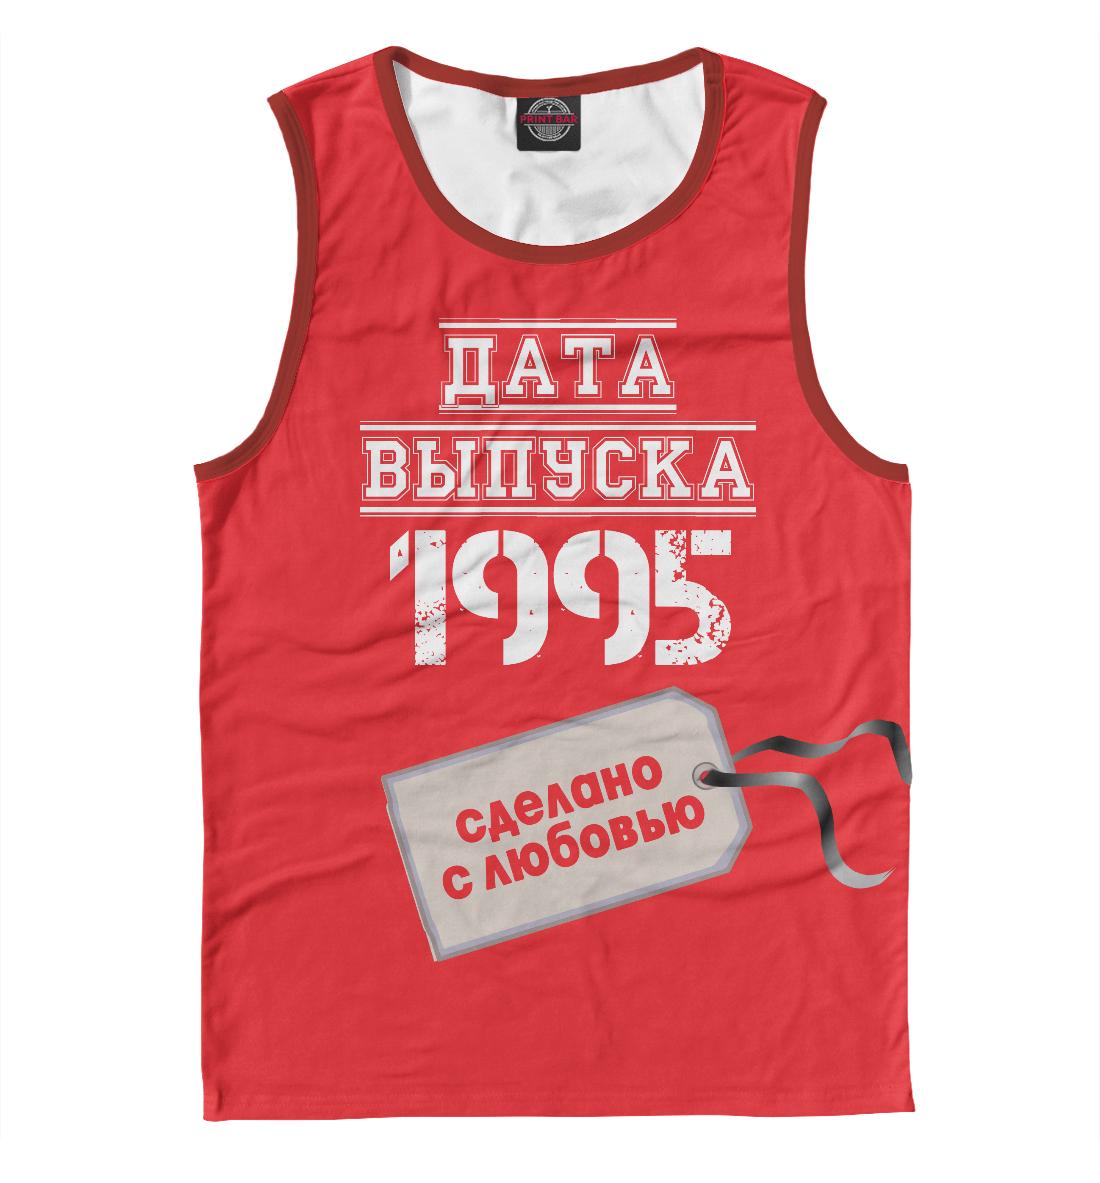 Купить Дата выпуска 1995, Printbar, Майки, DDP-200178-may-2